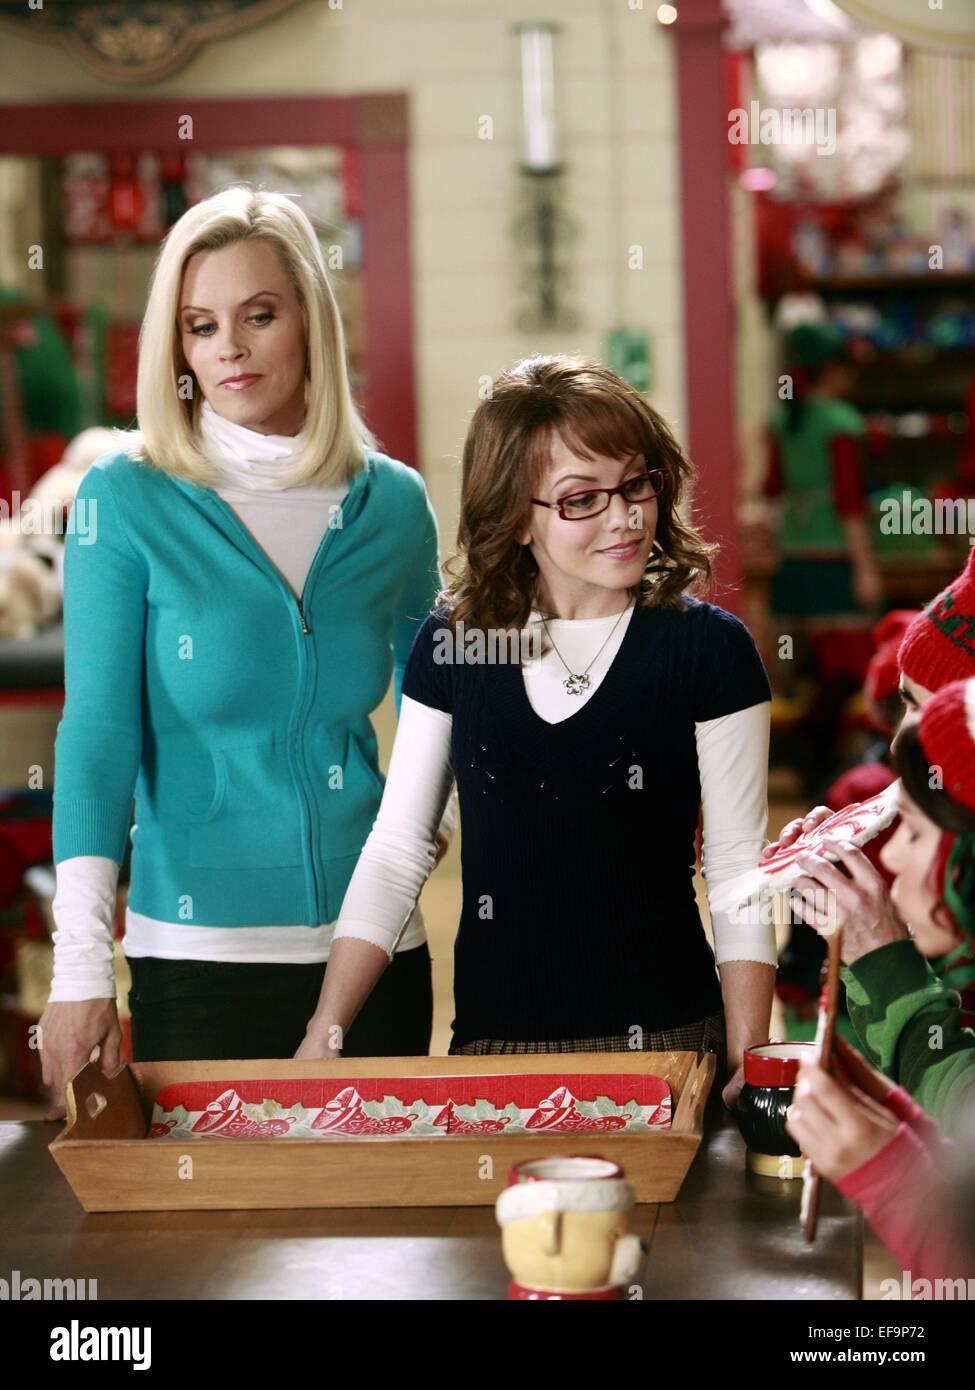 jenny mccarthy kelly stables santa baby 2 christmas maybe 2009 stock - Santa Baby 2 Christmas Maybe